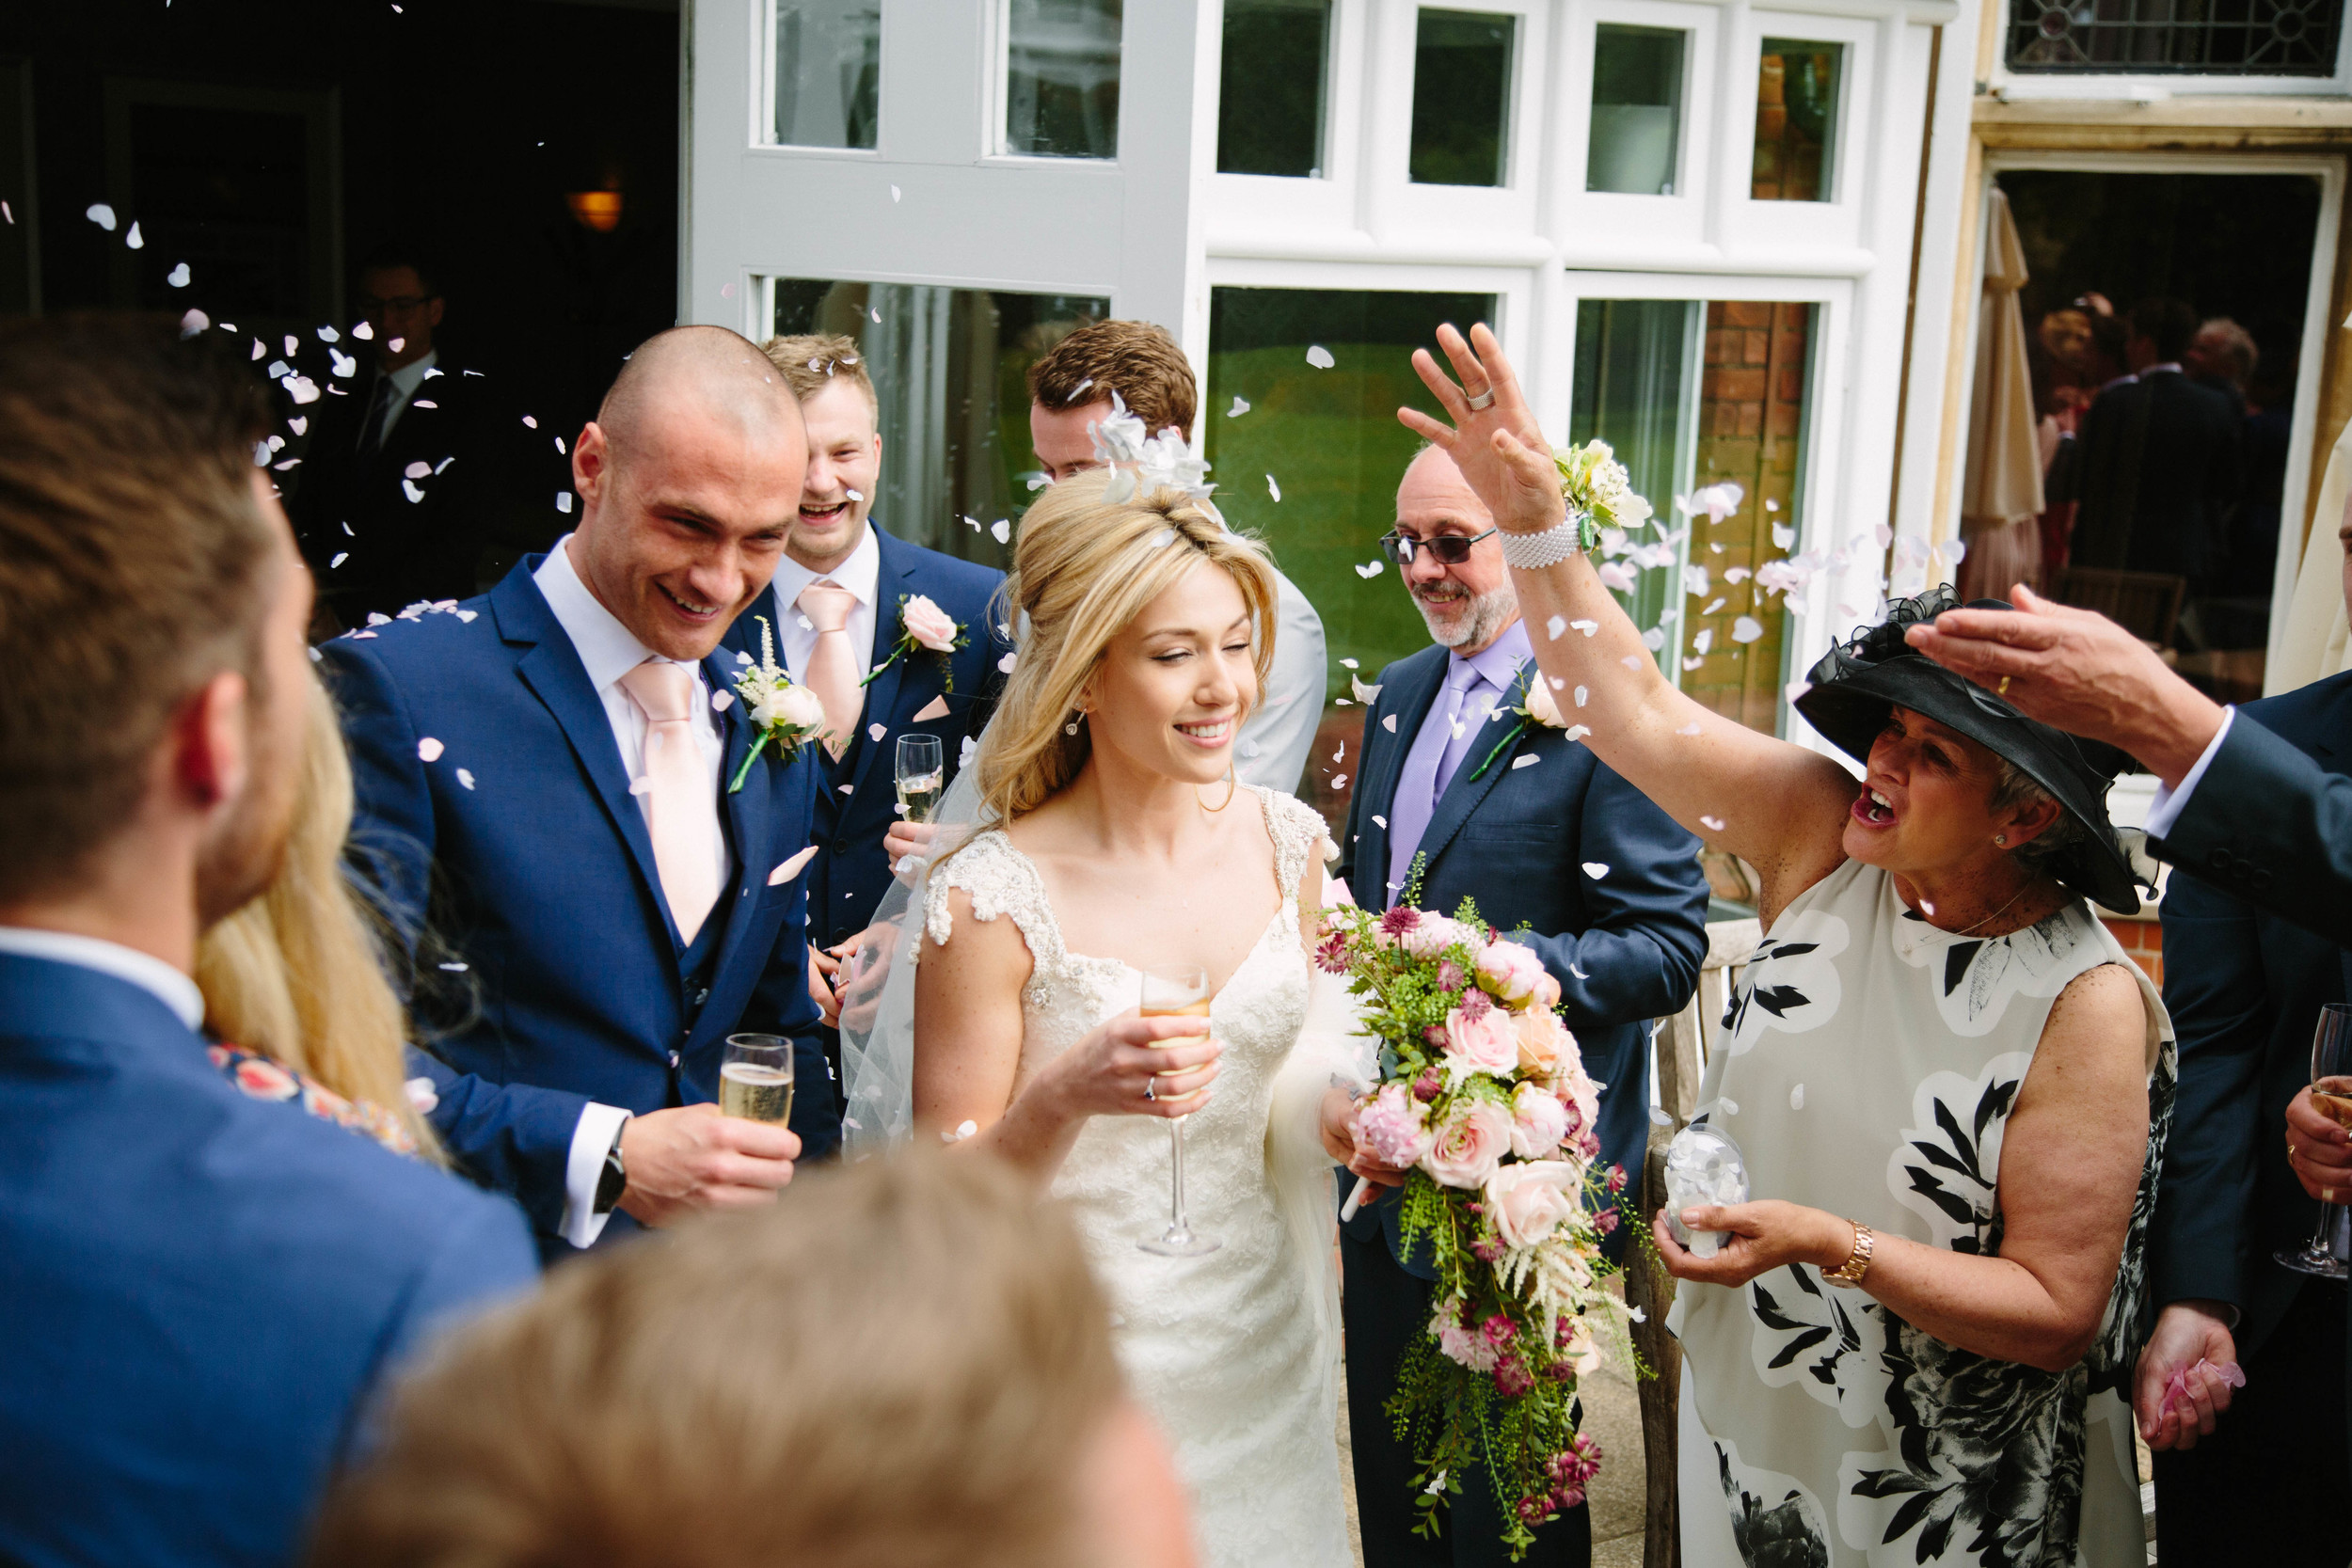 Woodlands-Park-Hotel-Cobham-Surrey-wedding-20